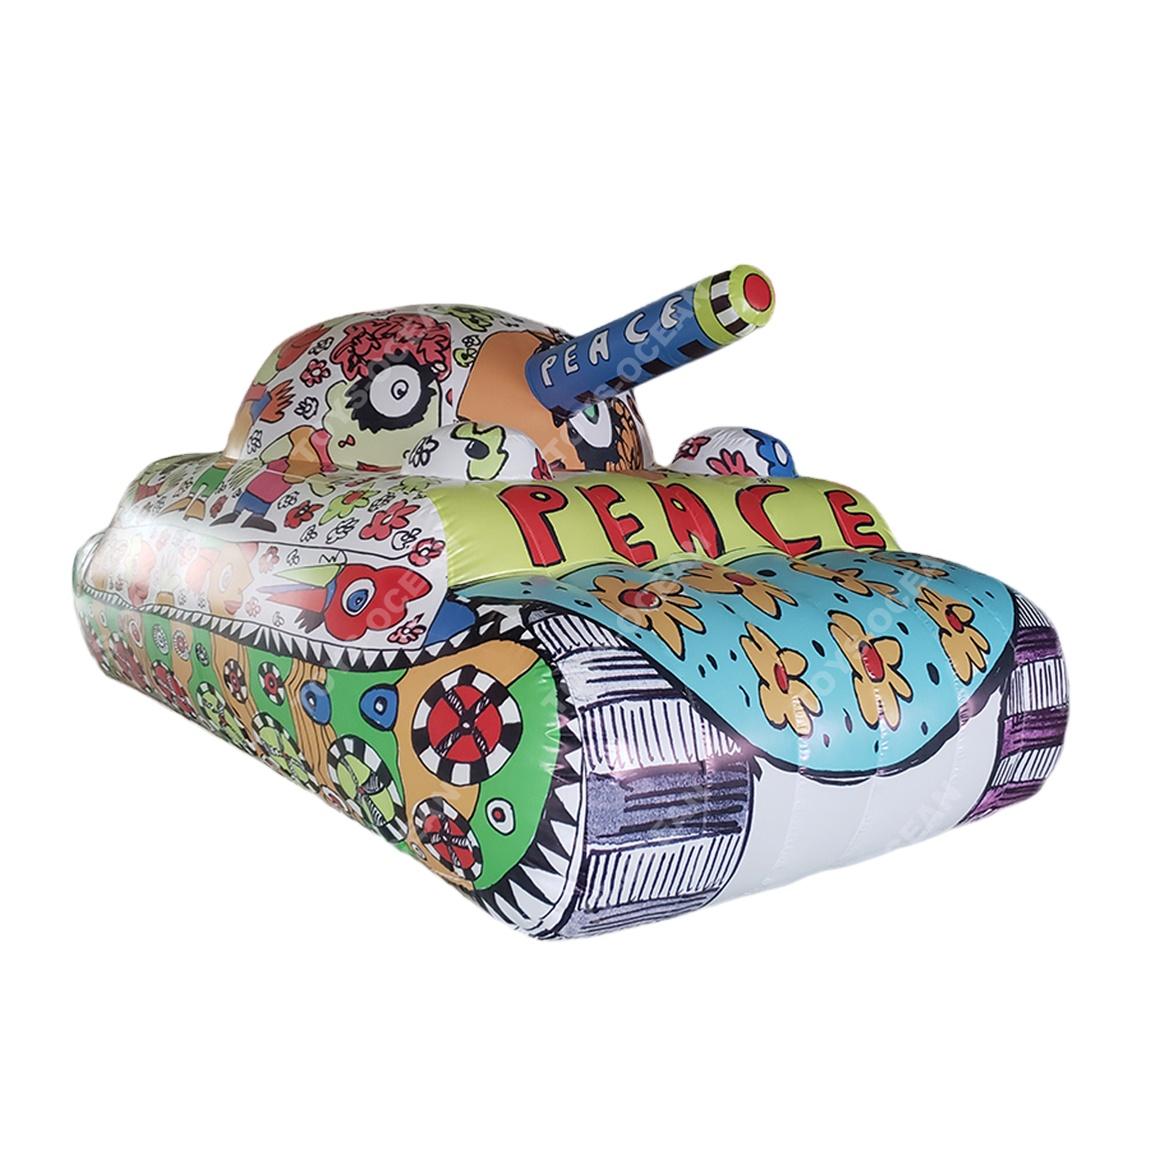 Lovely InflatableขนหมีMascotรุ่นโฆษณาขนาดใหญ่Inflatablesคริสต์มาส